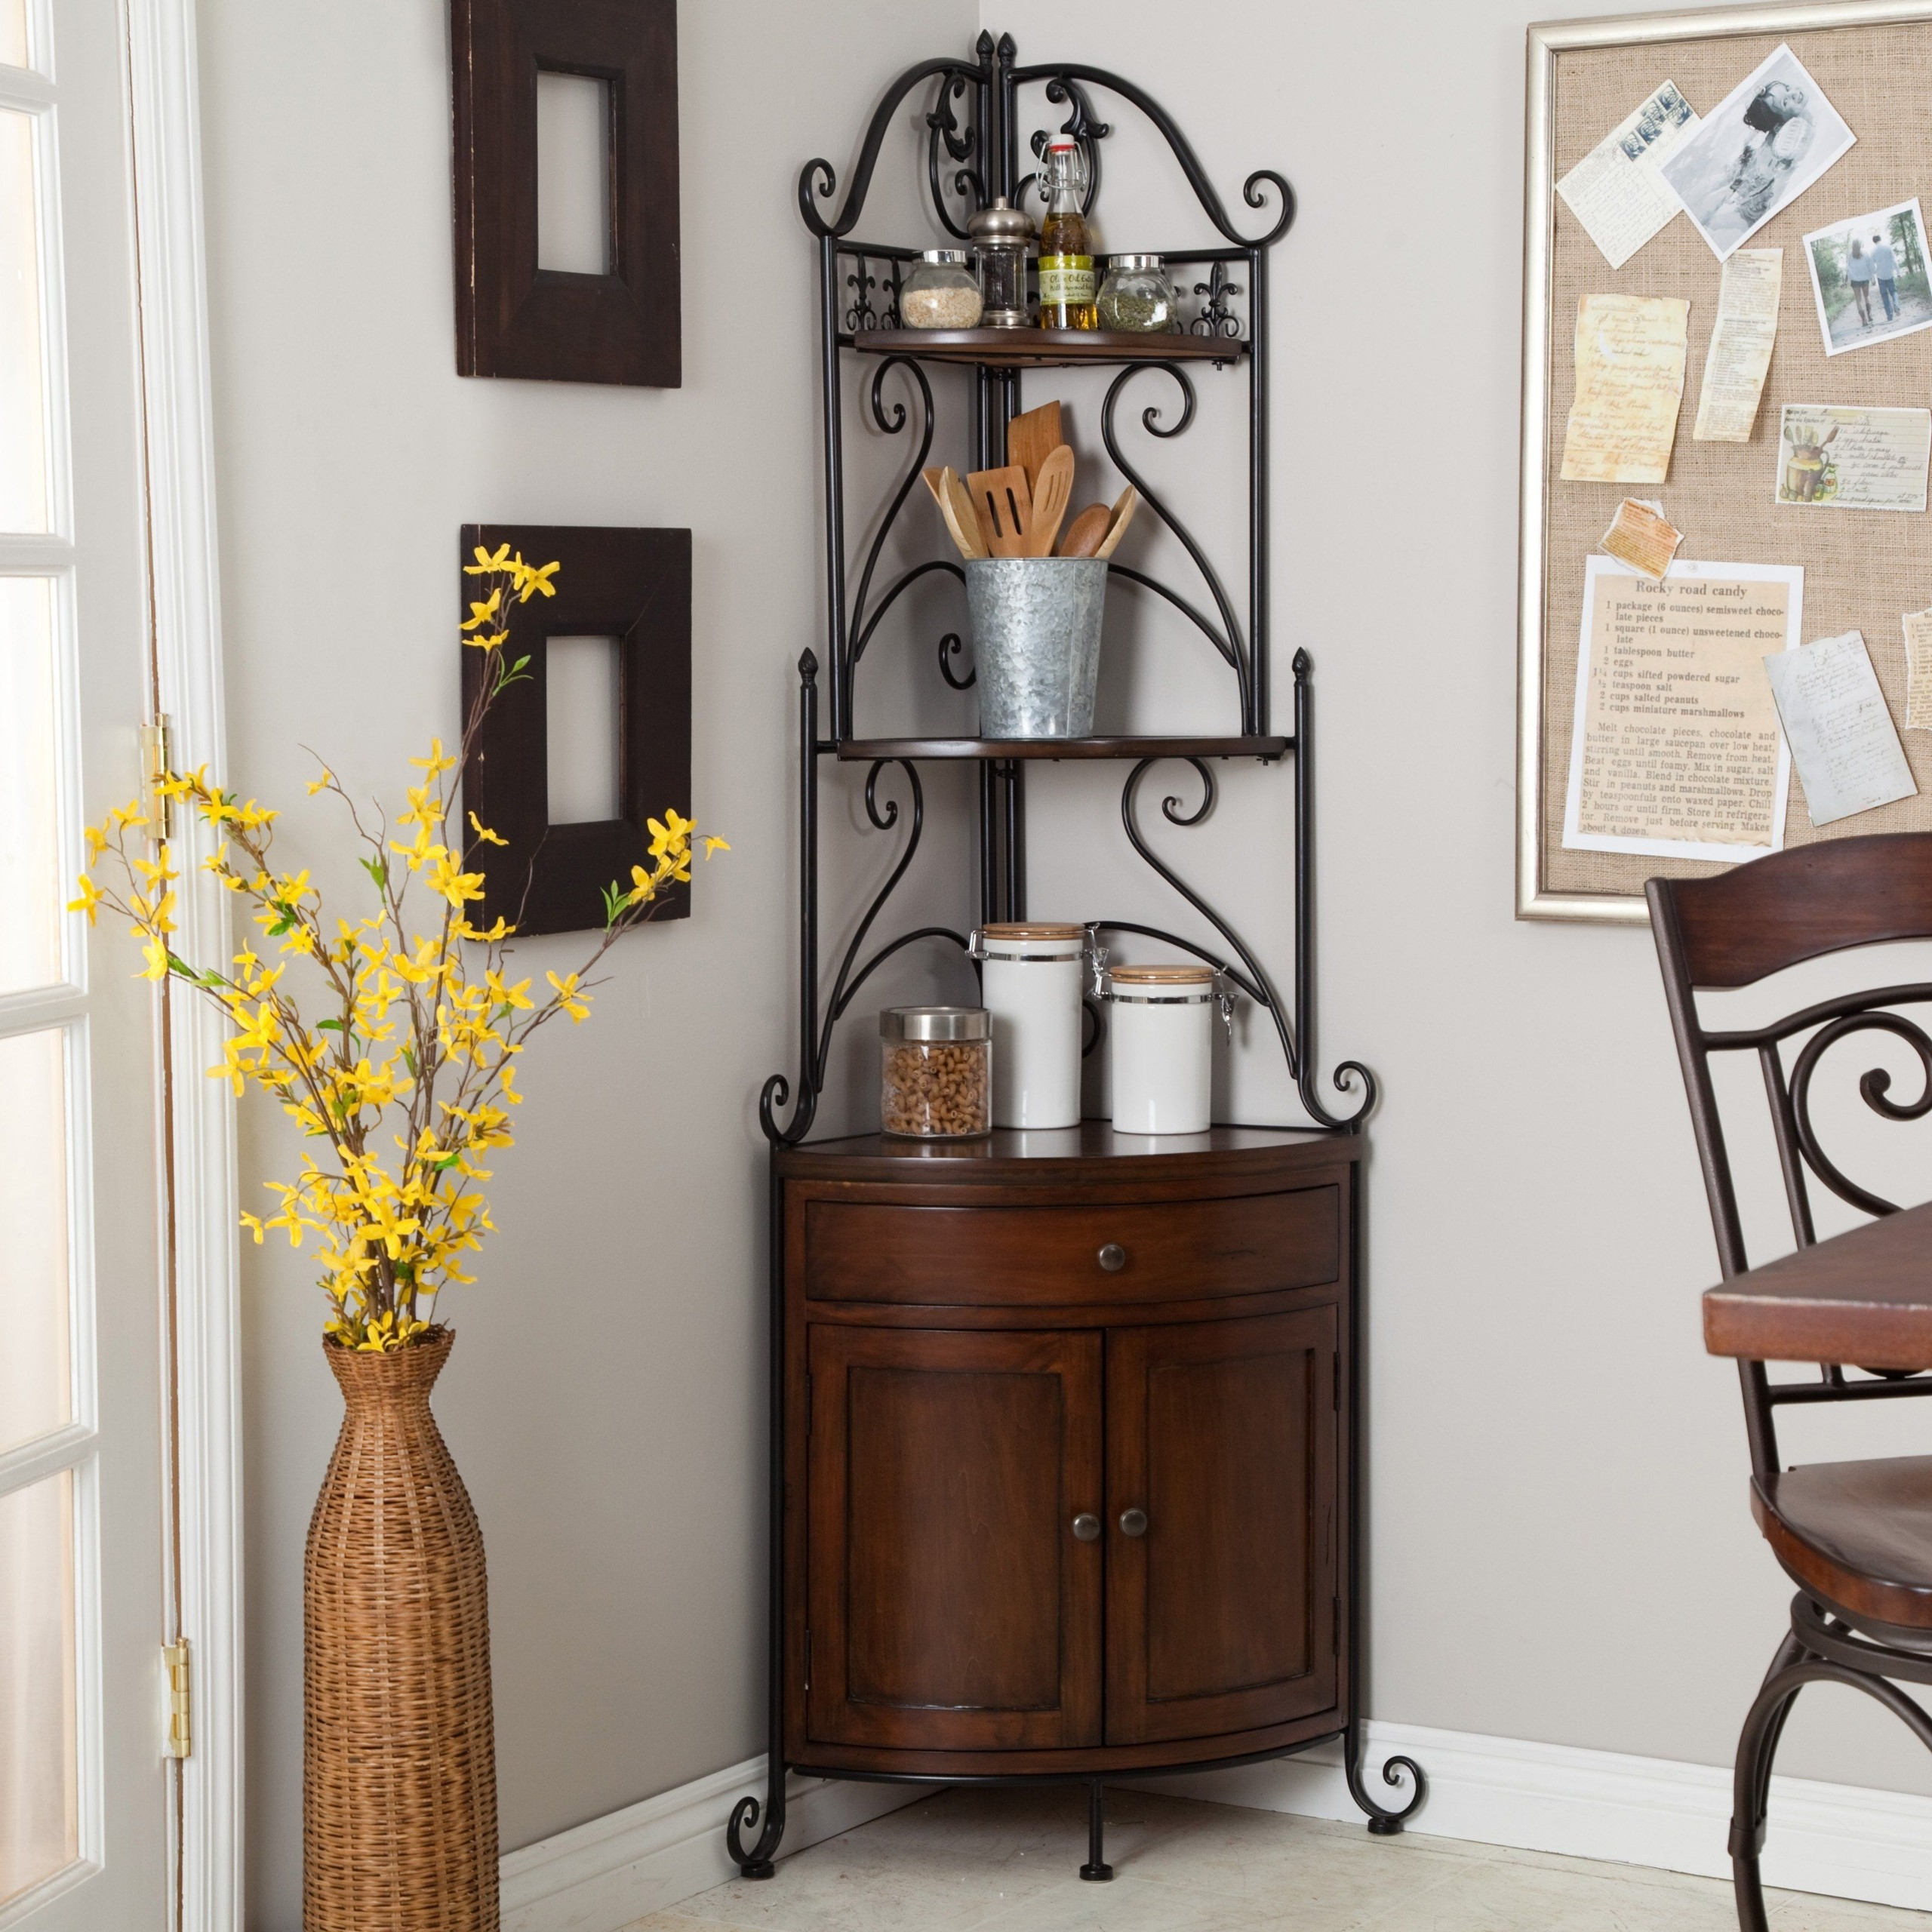 Corner wrought iron bakers rack metal wood kitchen cabinet shelf & Wrought Iron Corner Shelf - Foter